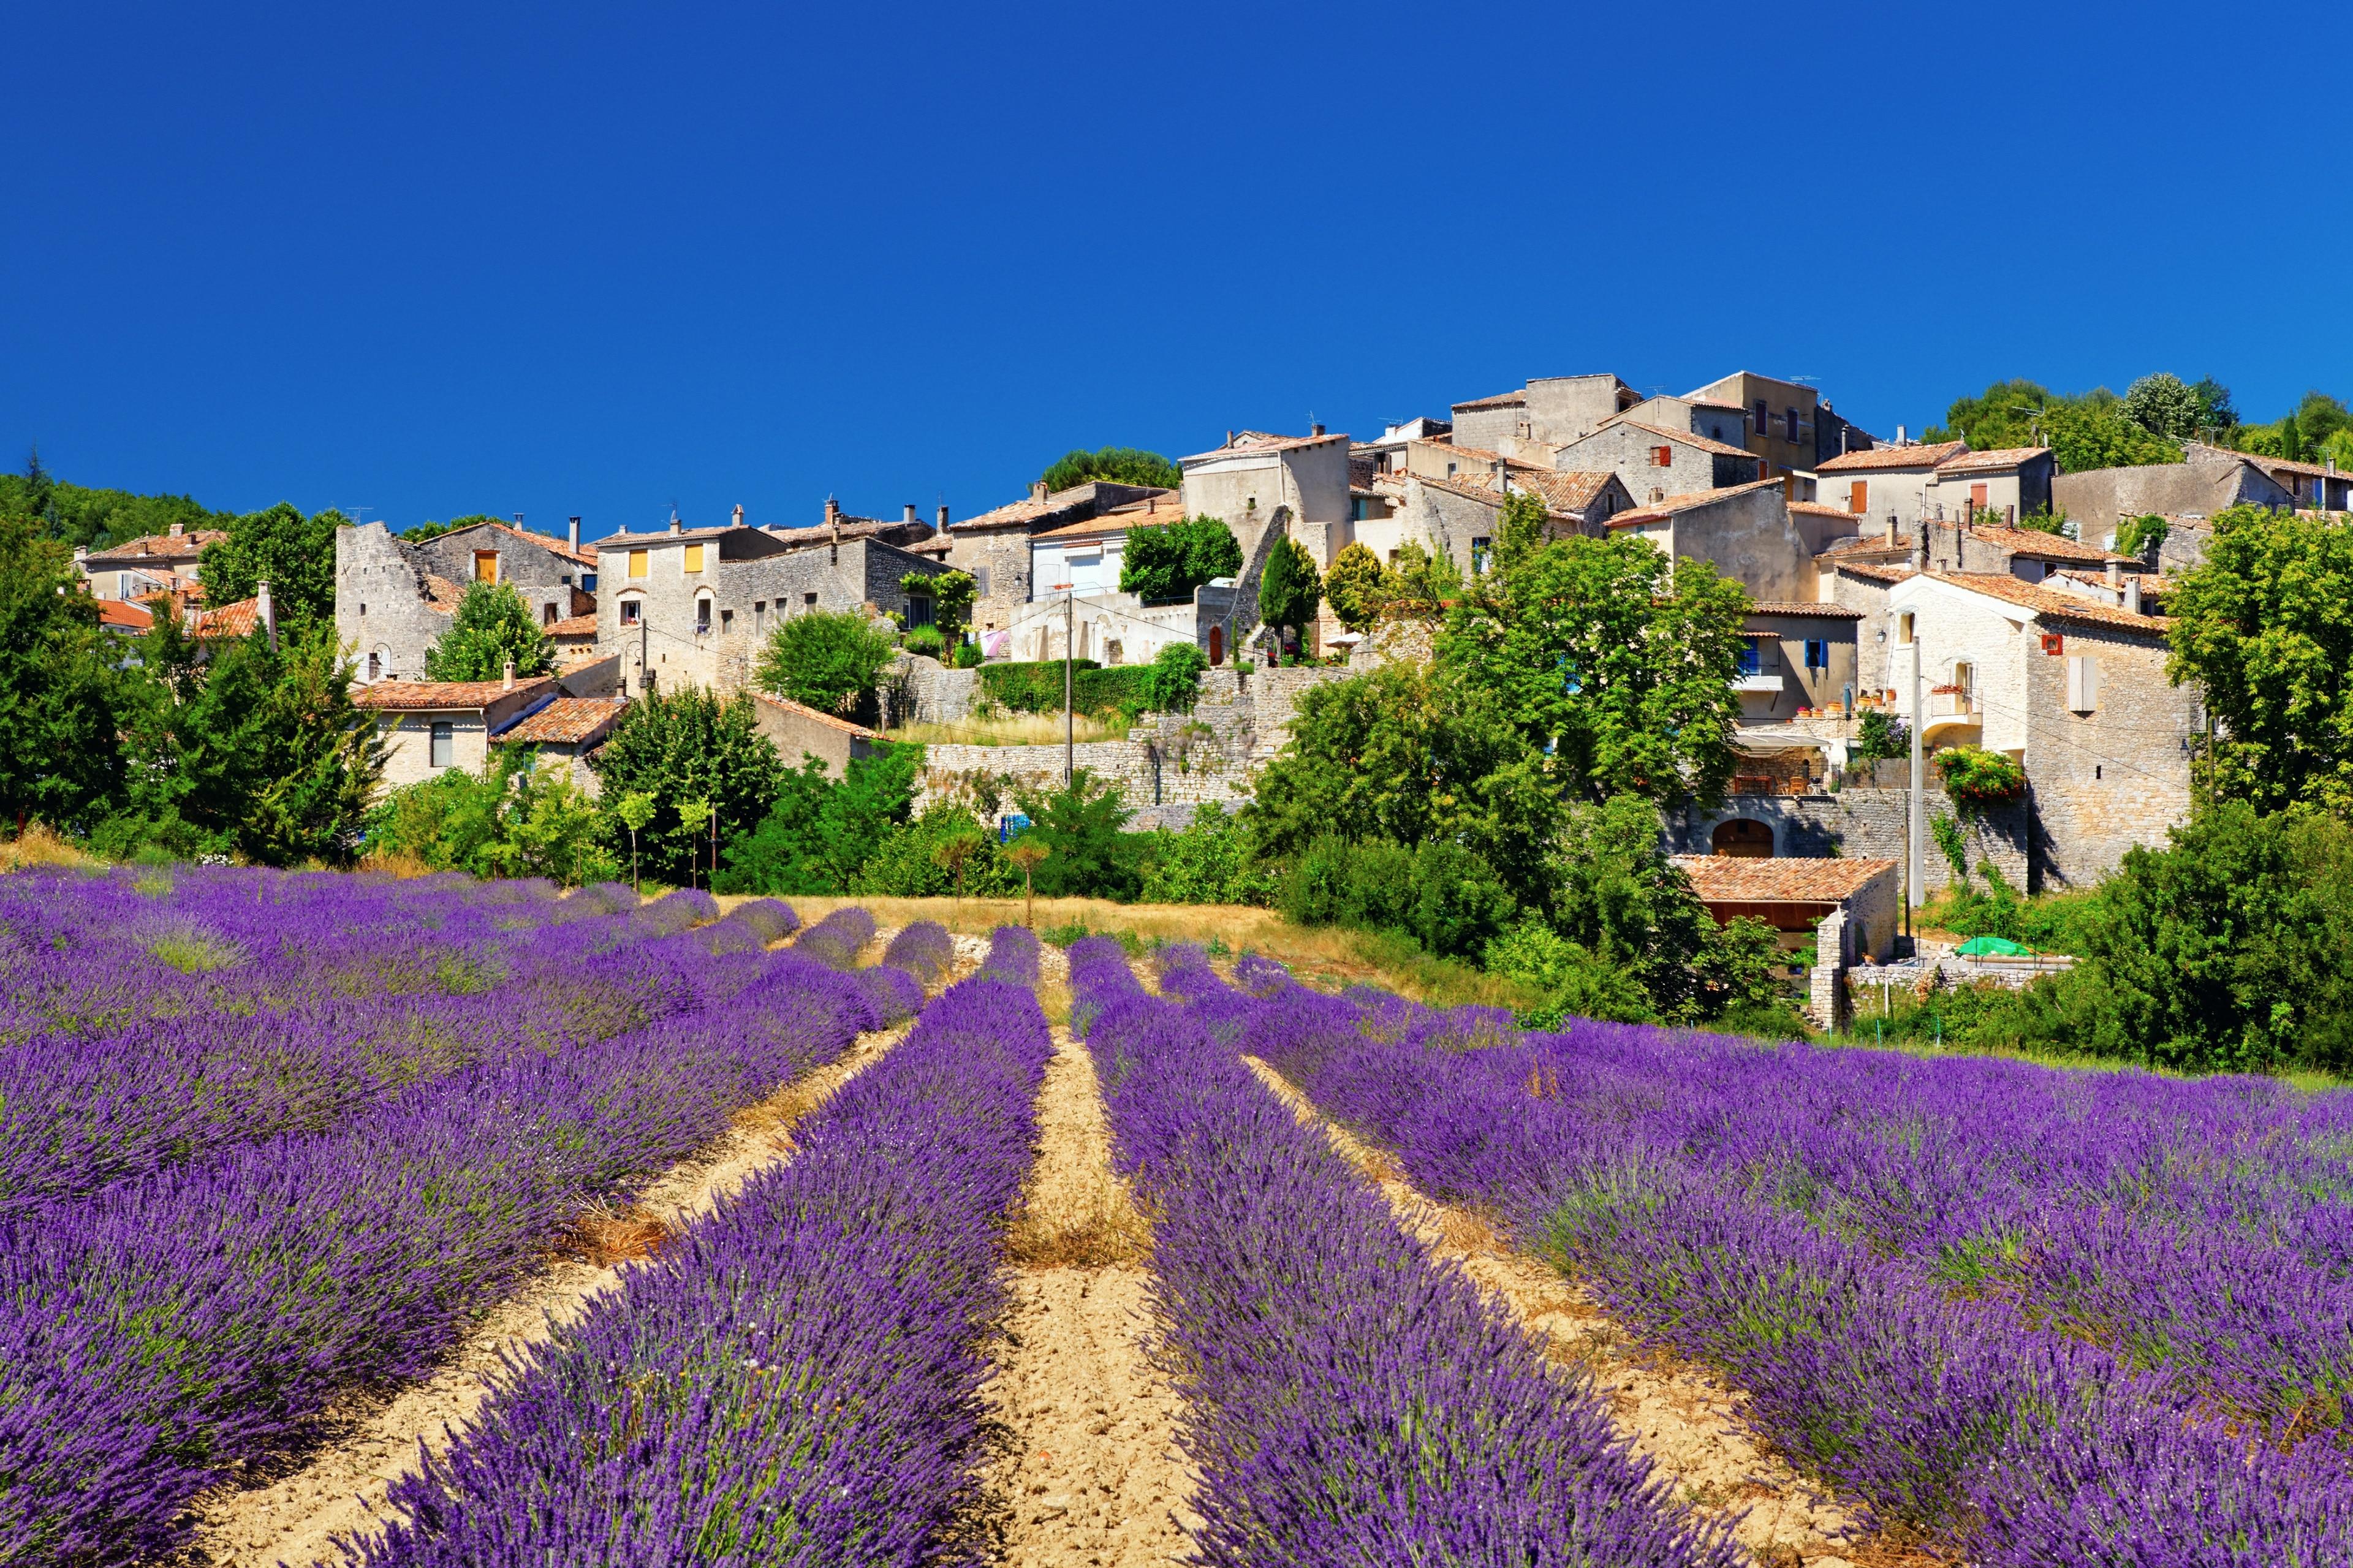 Pays d'Apt-Luberon, Vaucluse, France